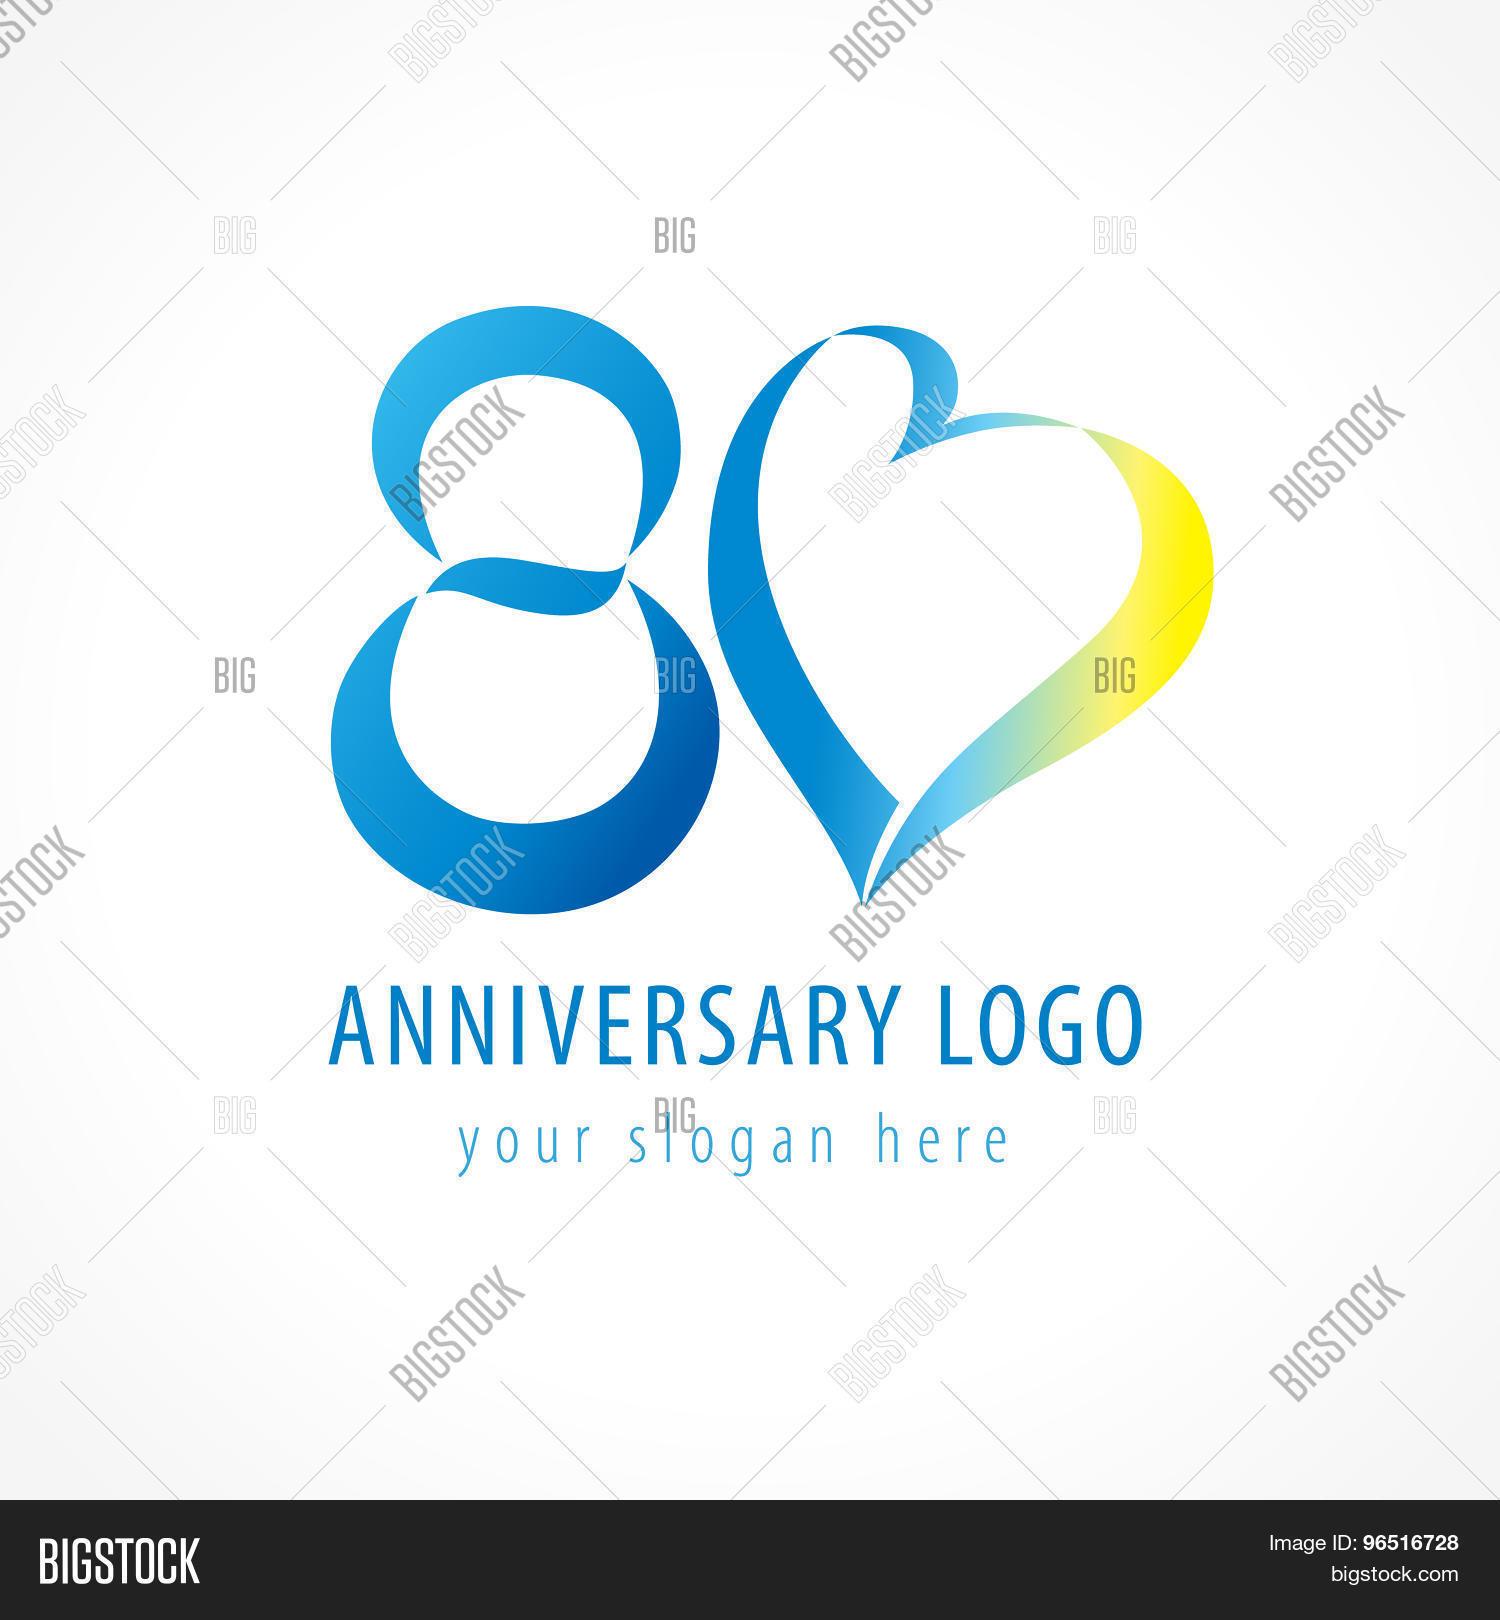 Anniversary 80 Years Vector Photo Free Trial Bigstock